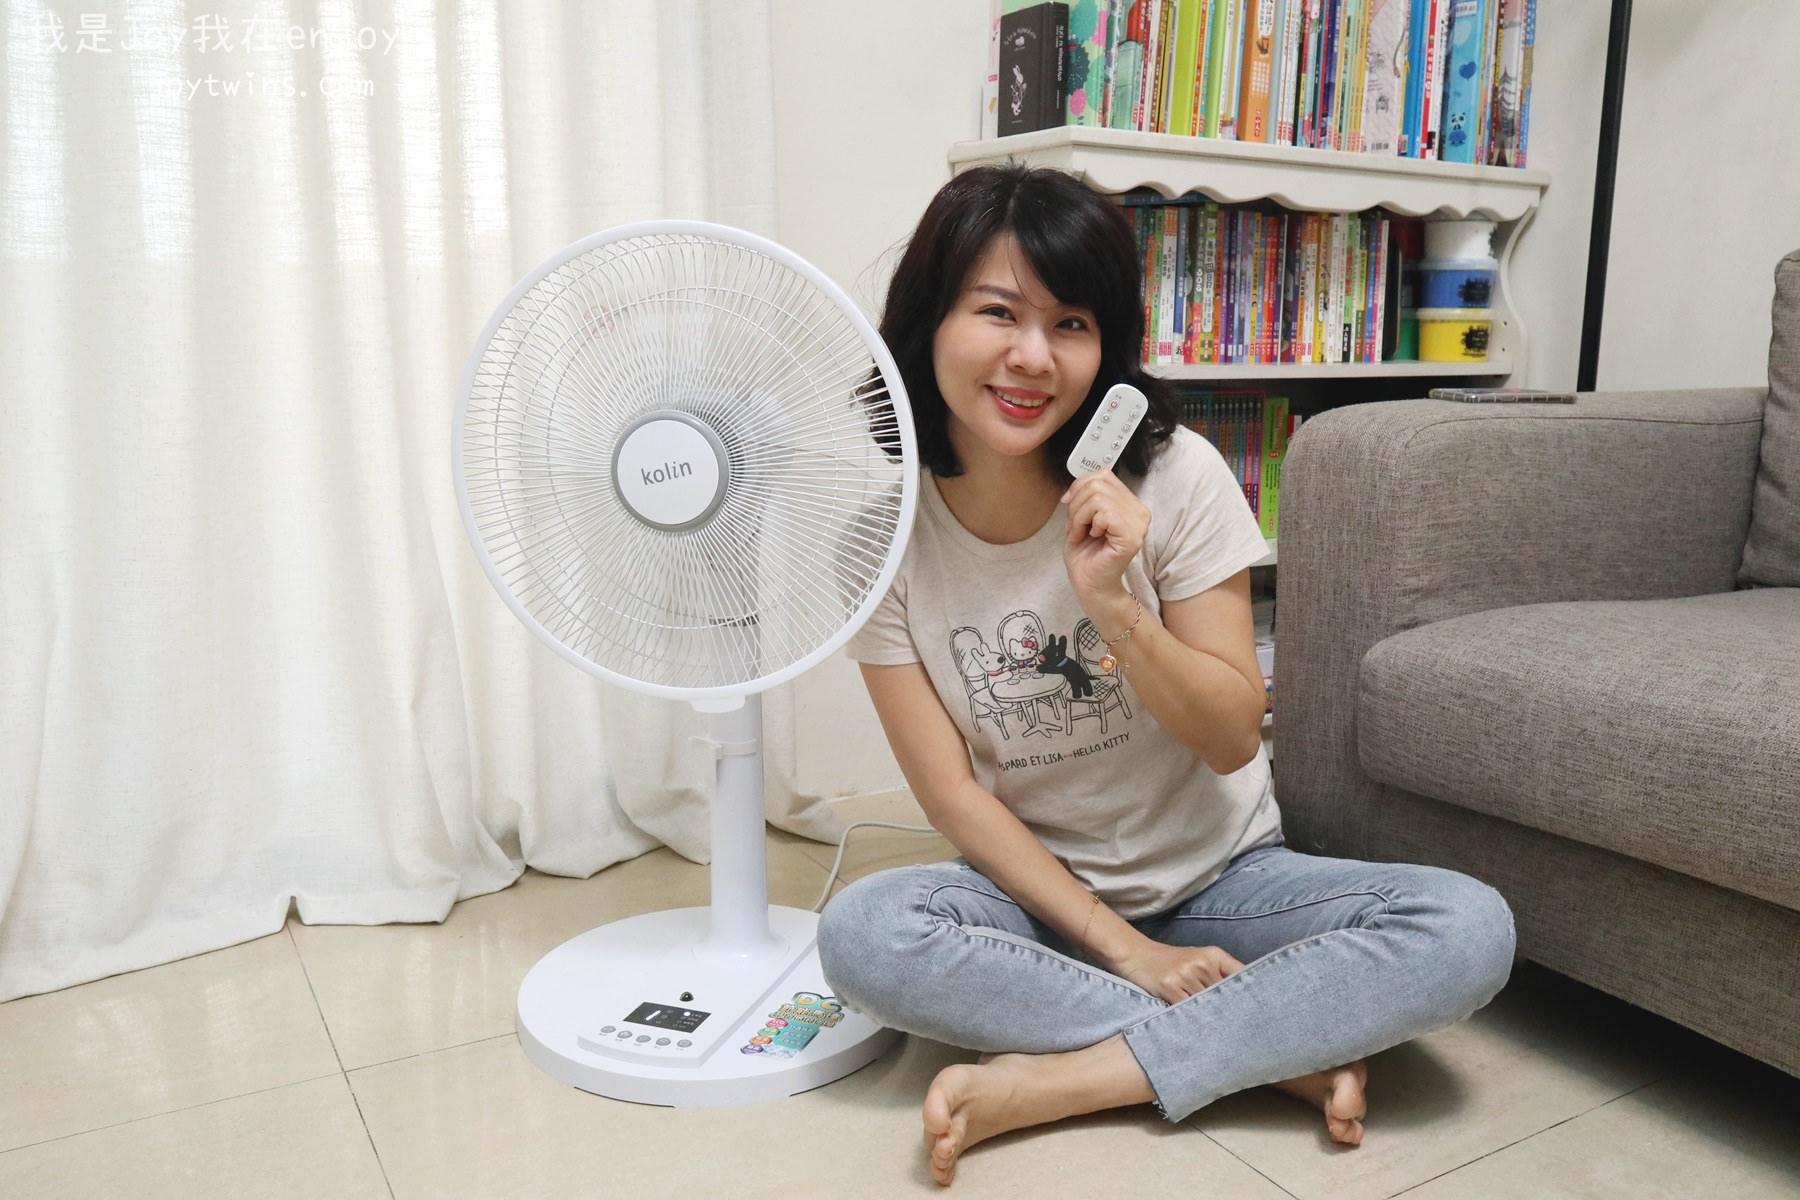 【Kolin 歌林】2020 momo獨家 14吋微電腦ECO智慧遙控擺頭DC節能風扇 不只聰明更環保省電!